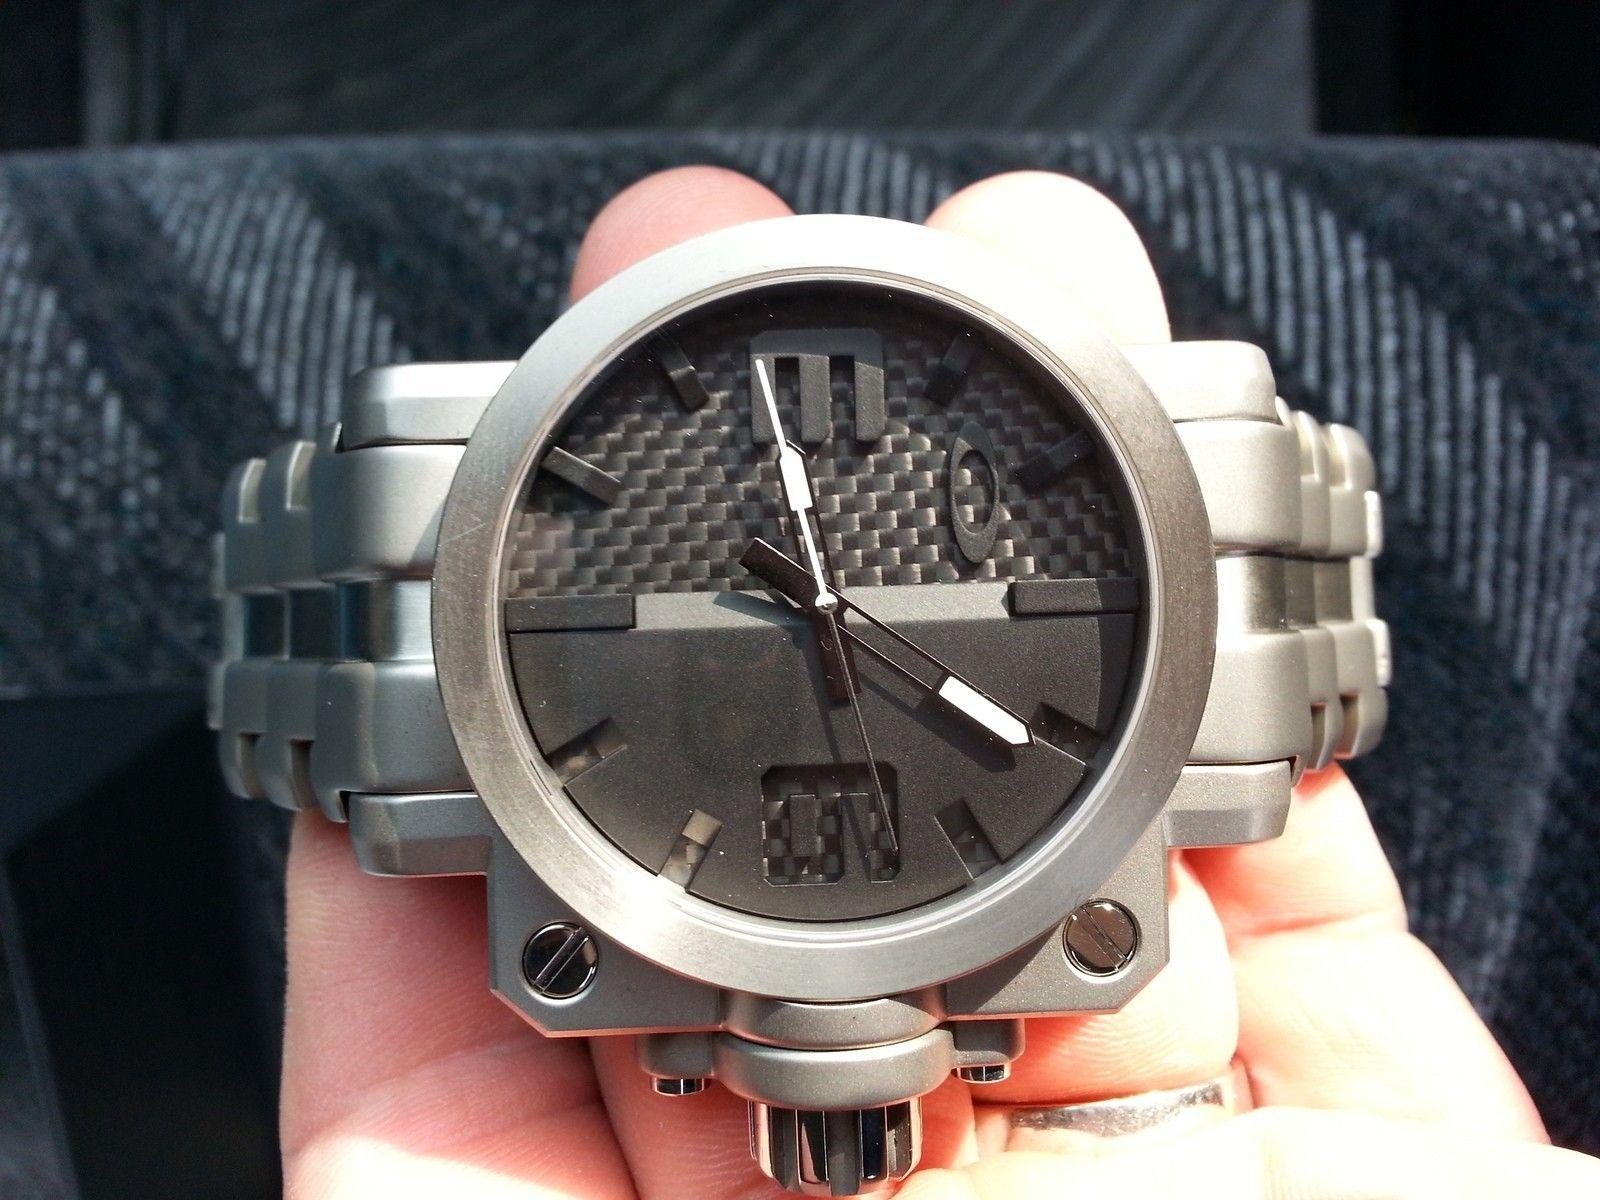 Black Friday Sale: Gearbox Titanium Bracelet - ATT_1448915154047_32267.jpeg